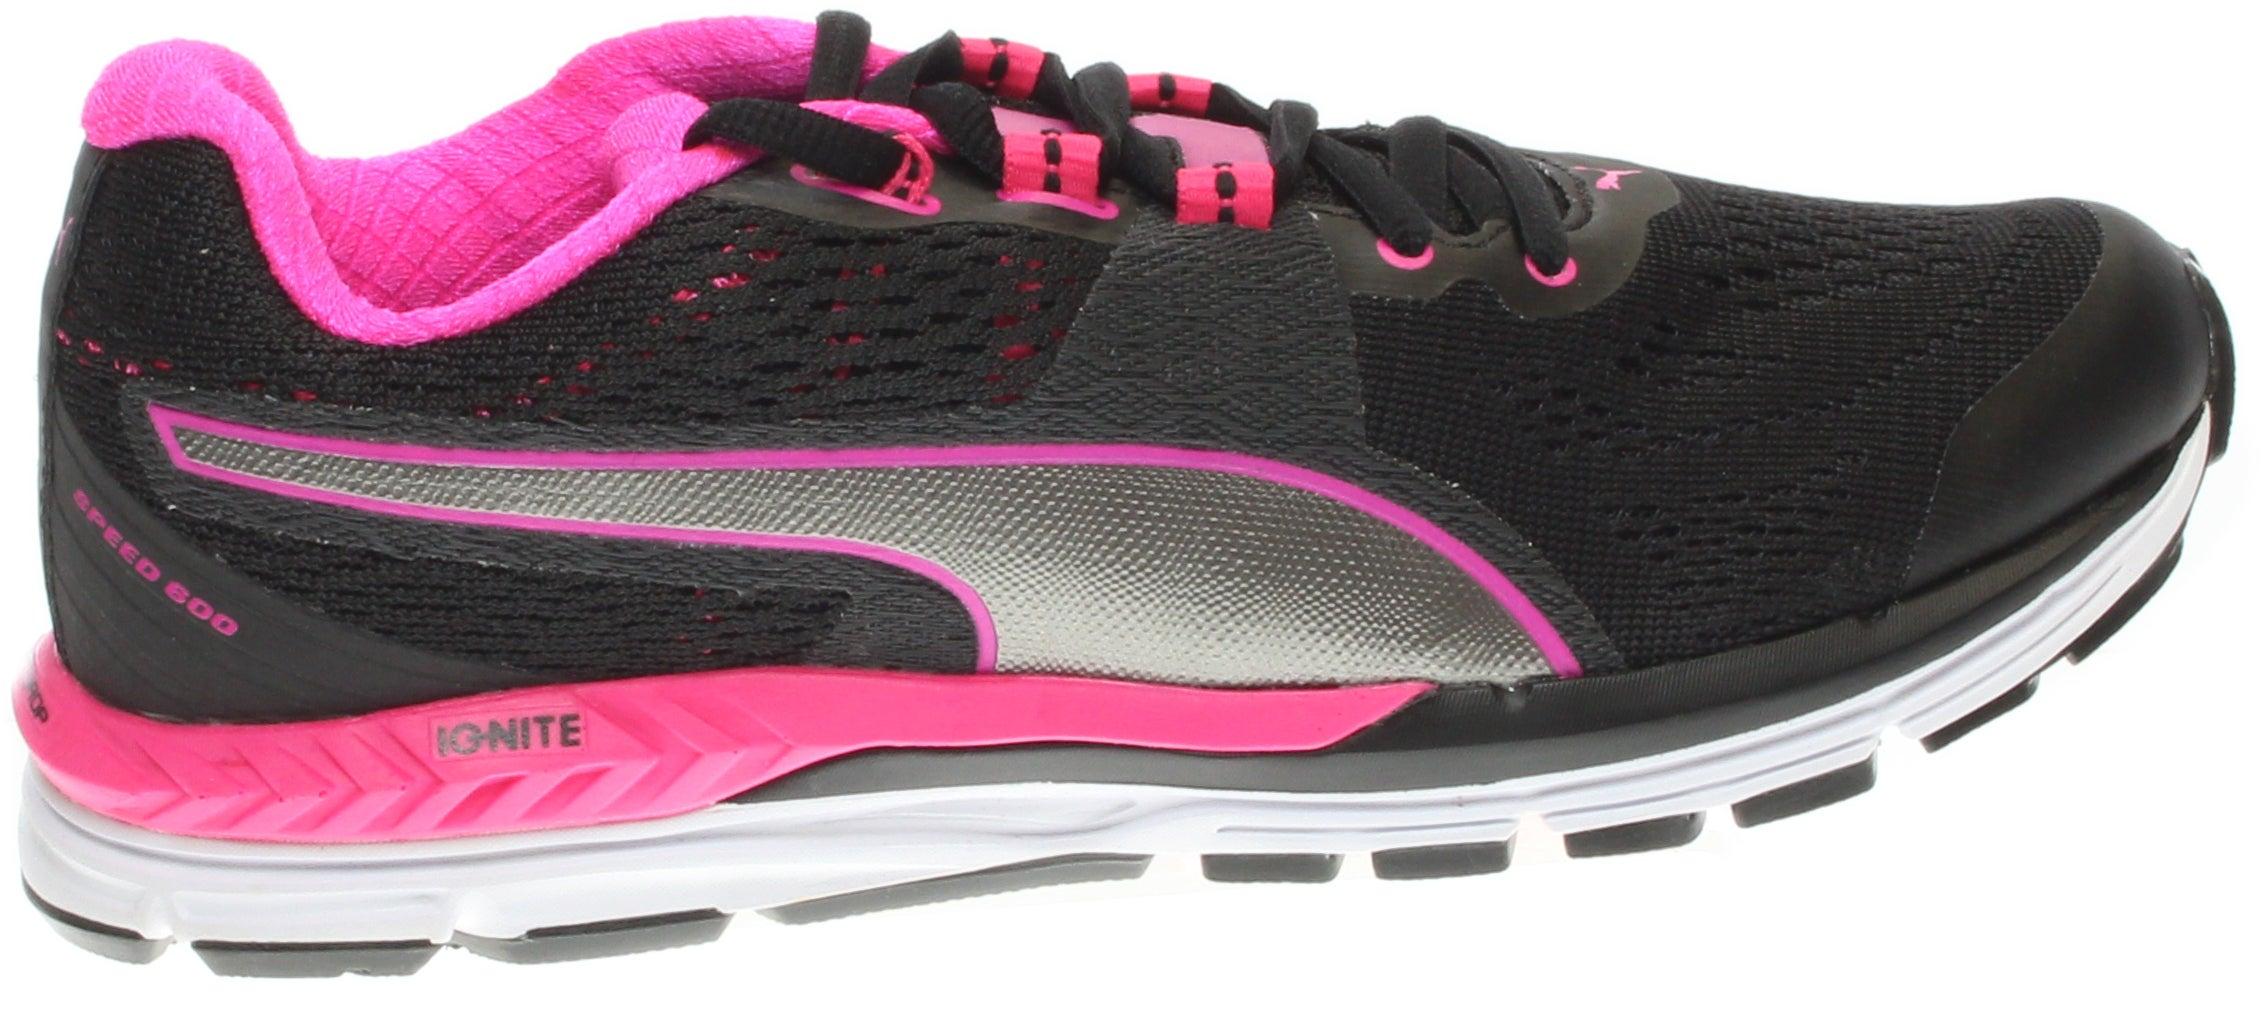 Puma Speed 600 IGNITE Women's Running Shoes Black - Womens  - Size 9